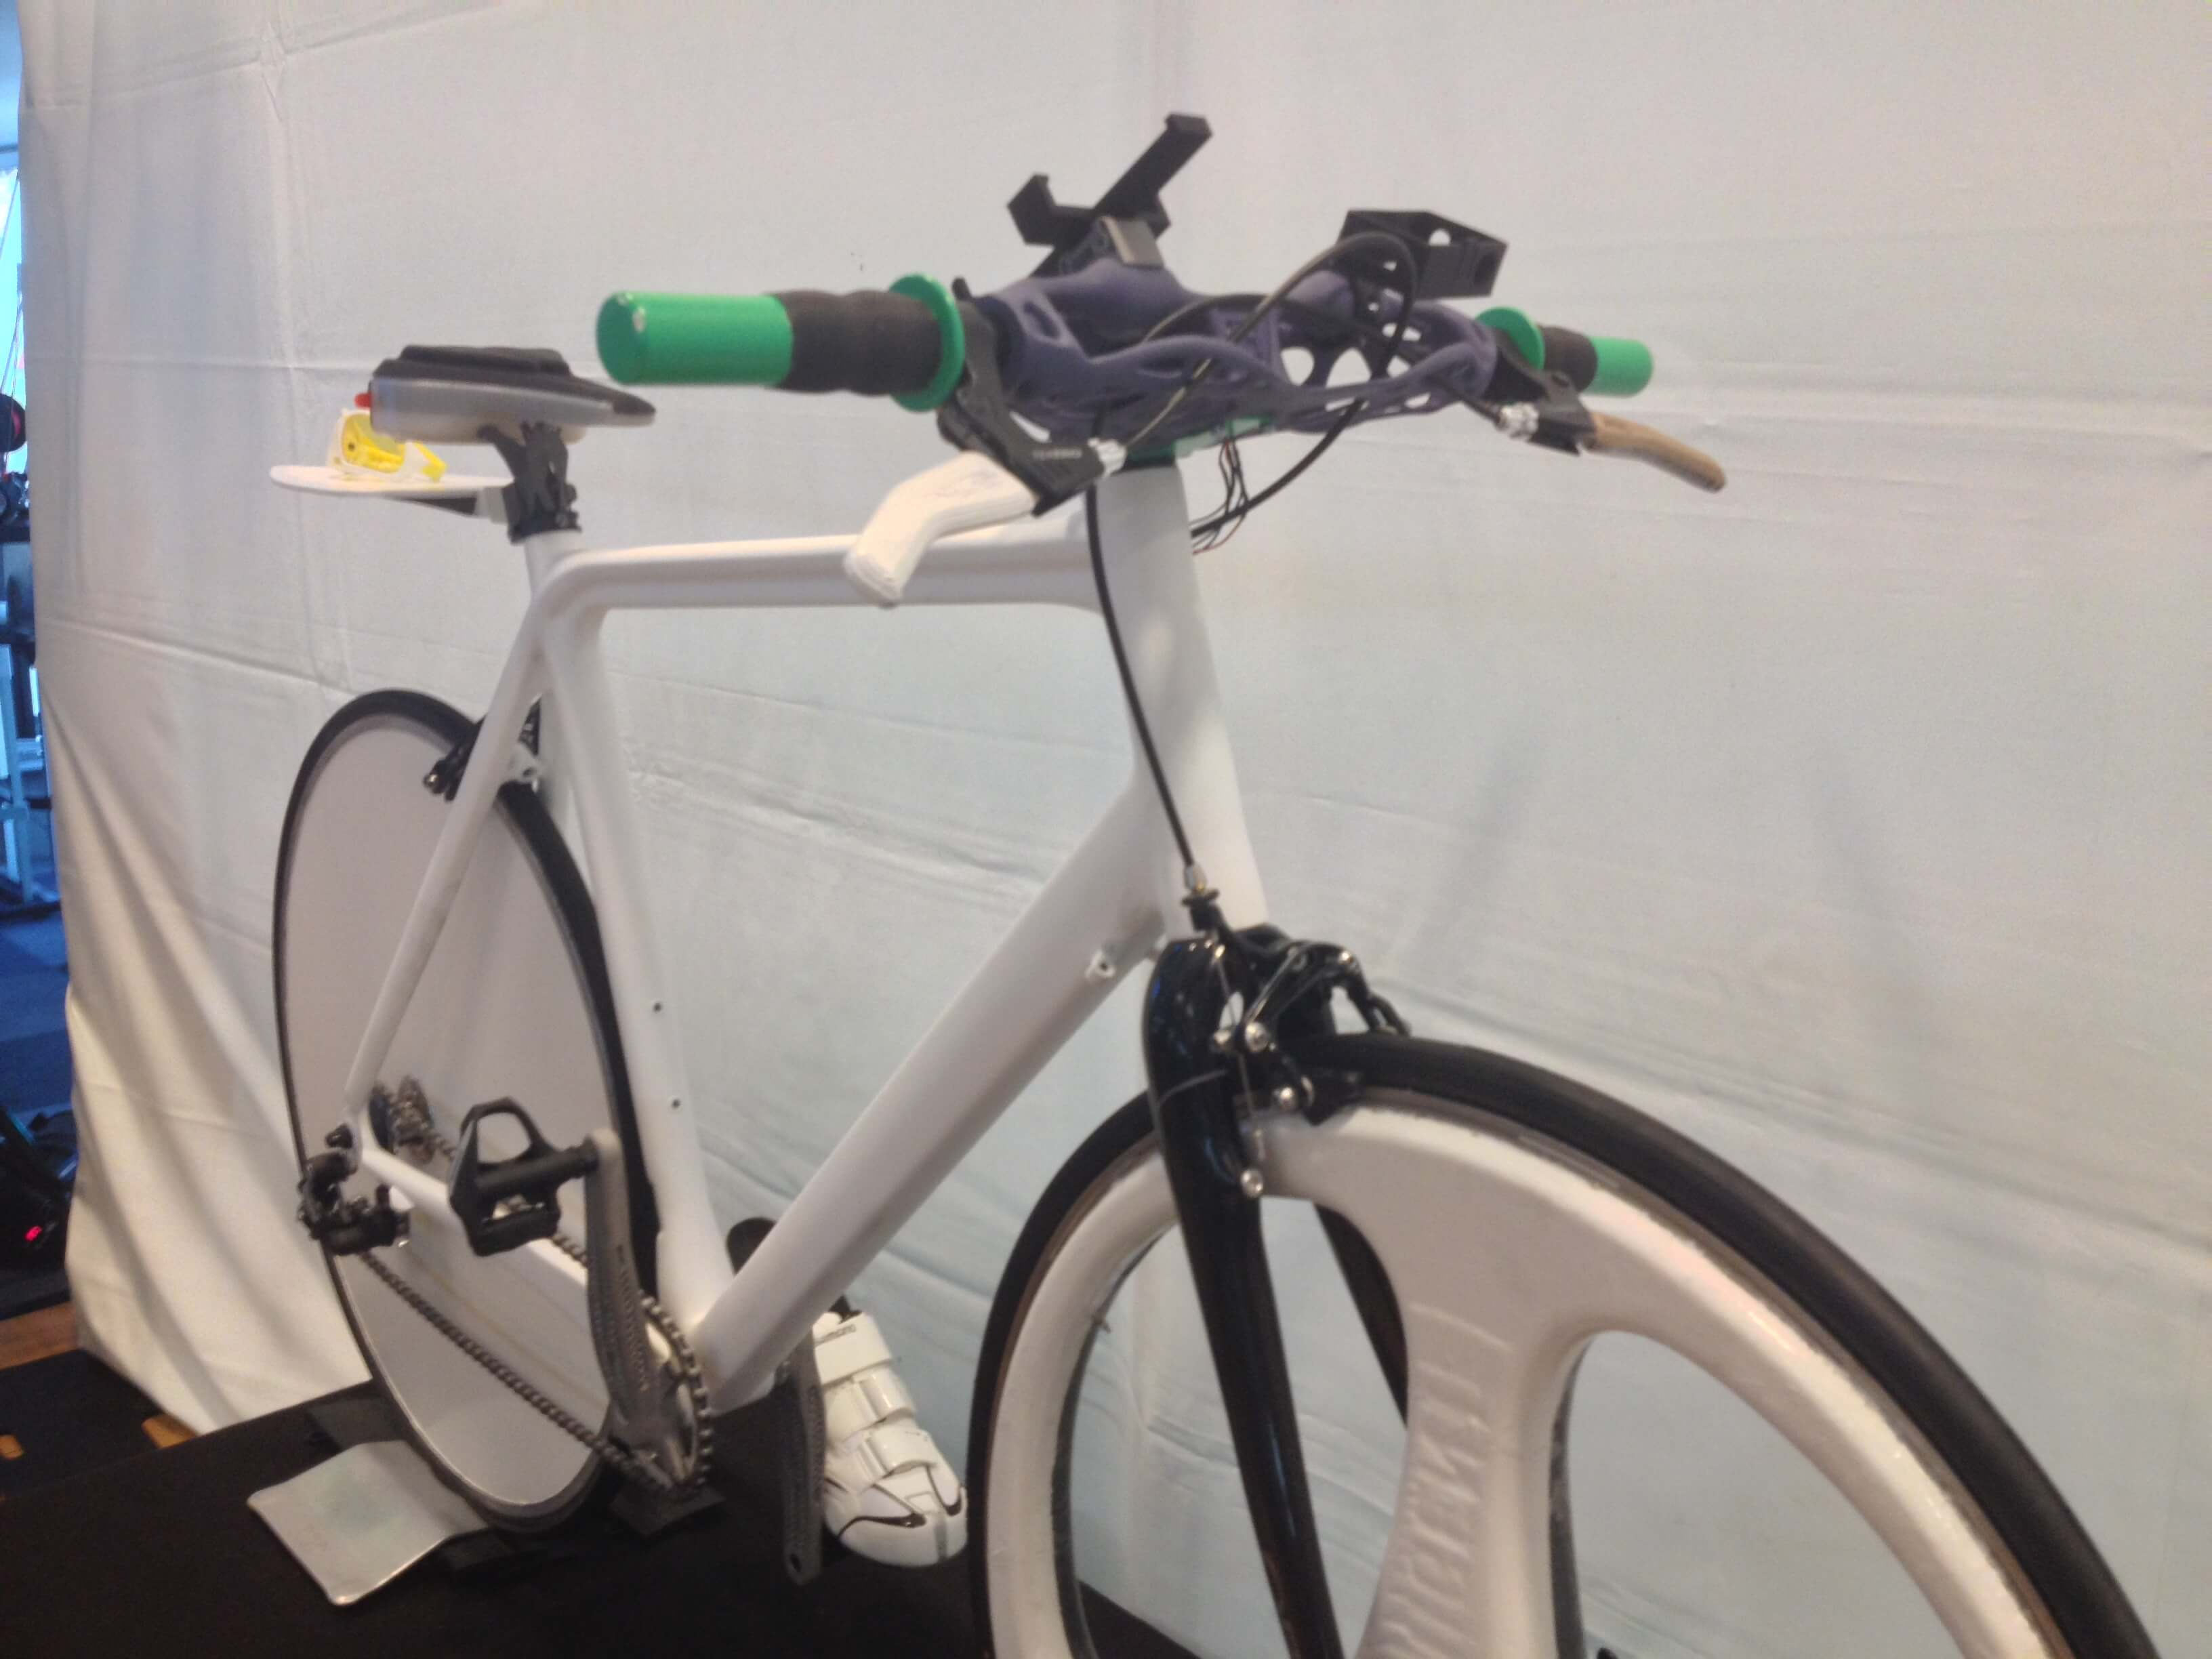 Flam王D заново изобрели велосипед – они его напечатали!